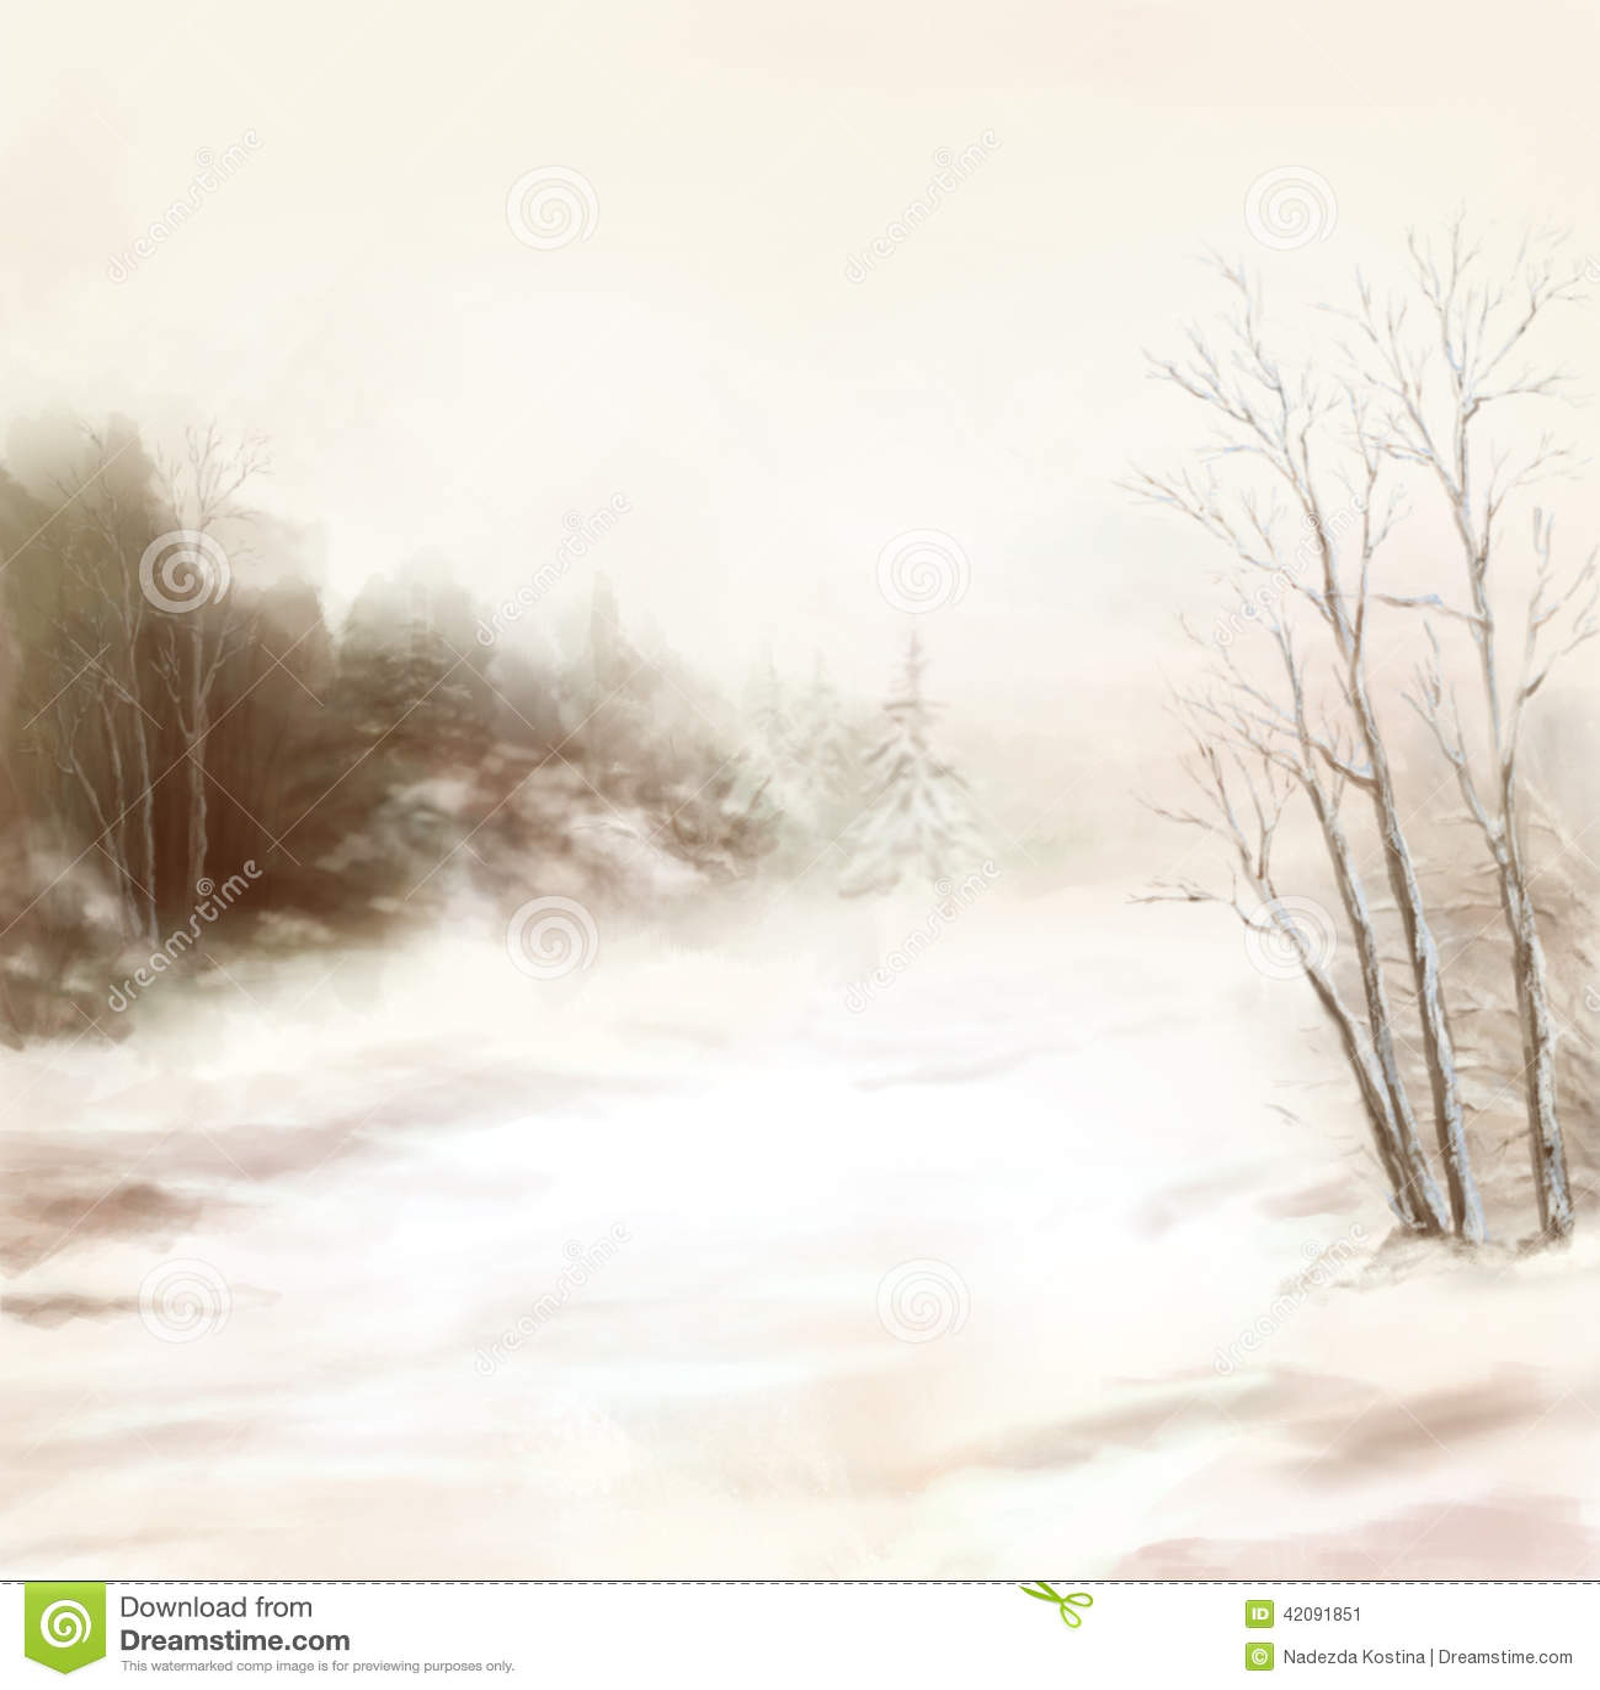 Winter River Birds Watercolor Landscape In Mist Stock